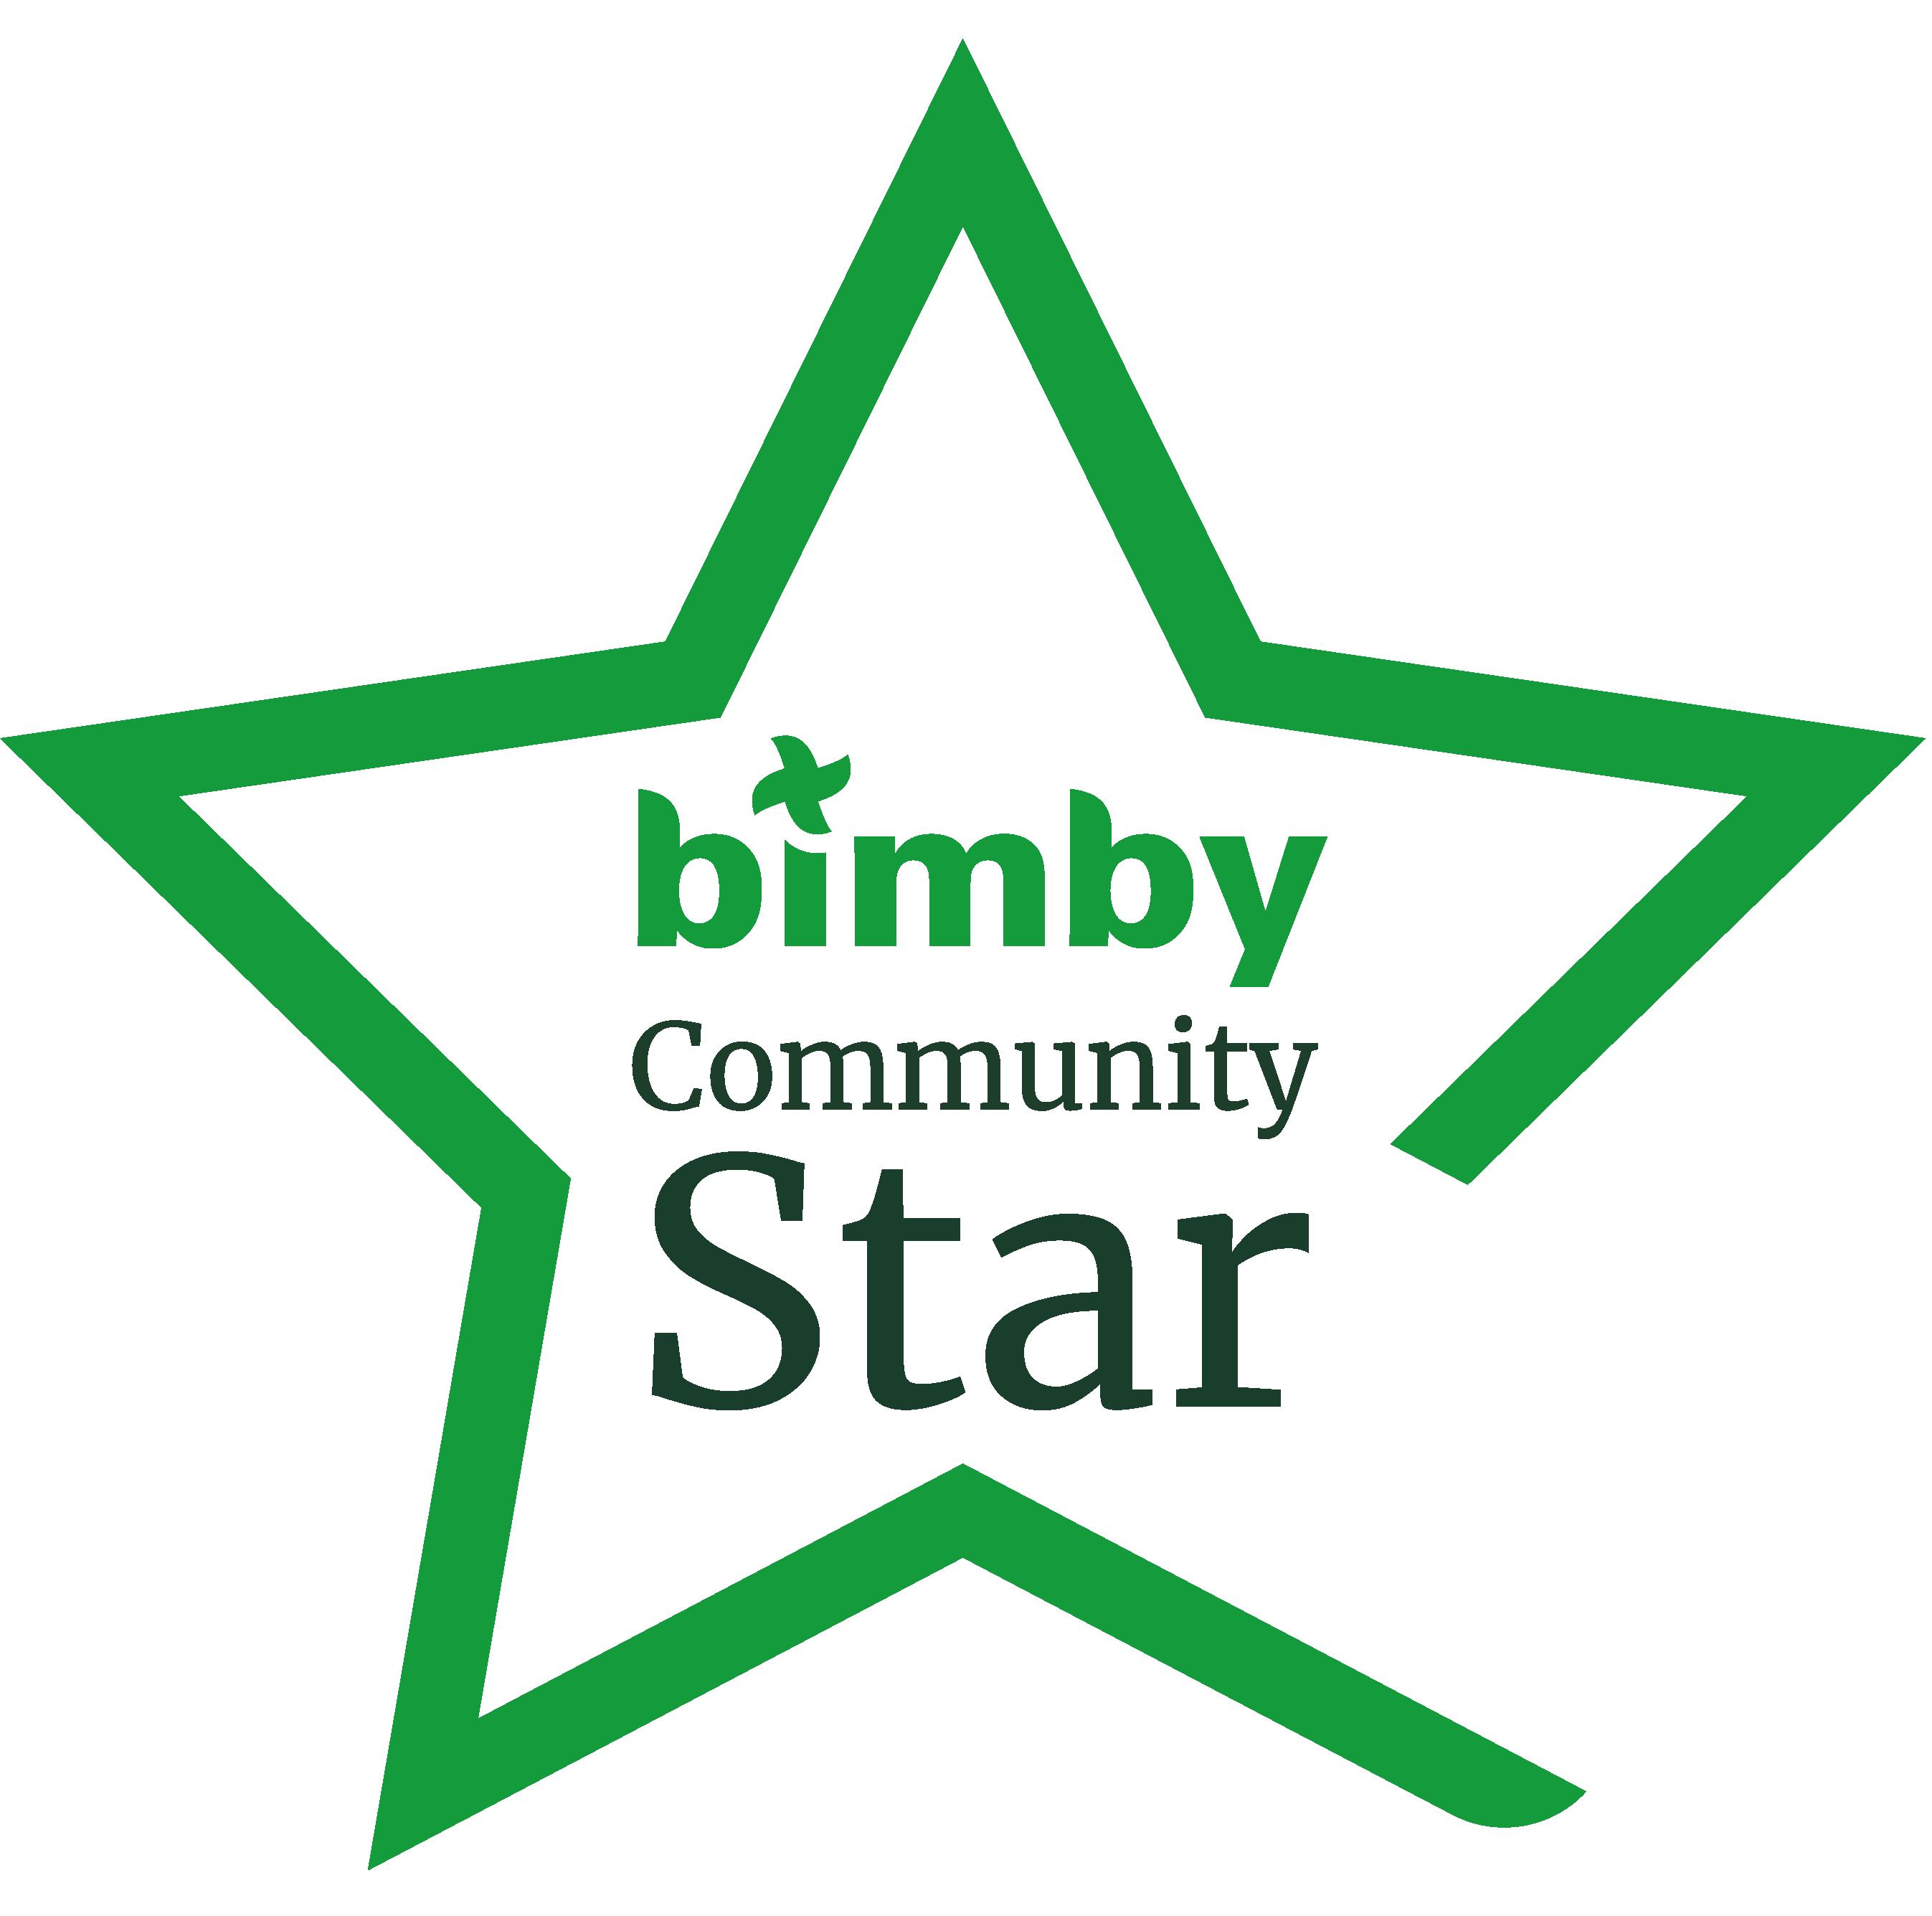 Community Star